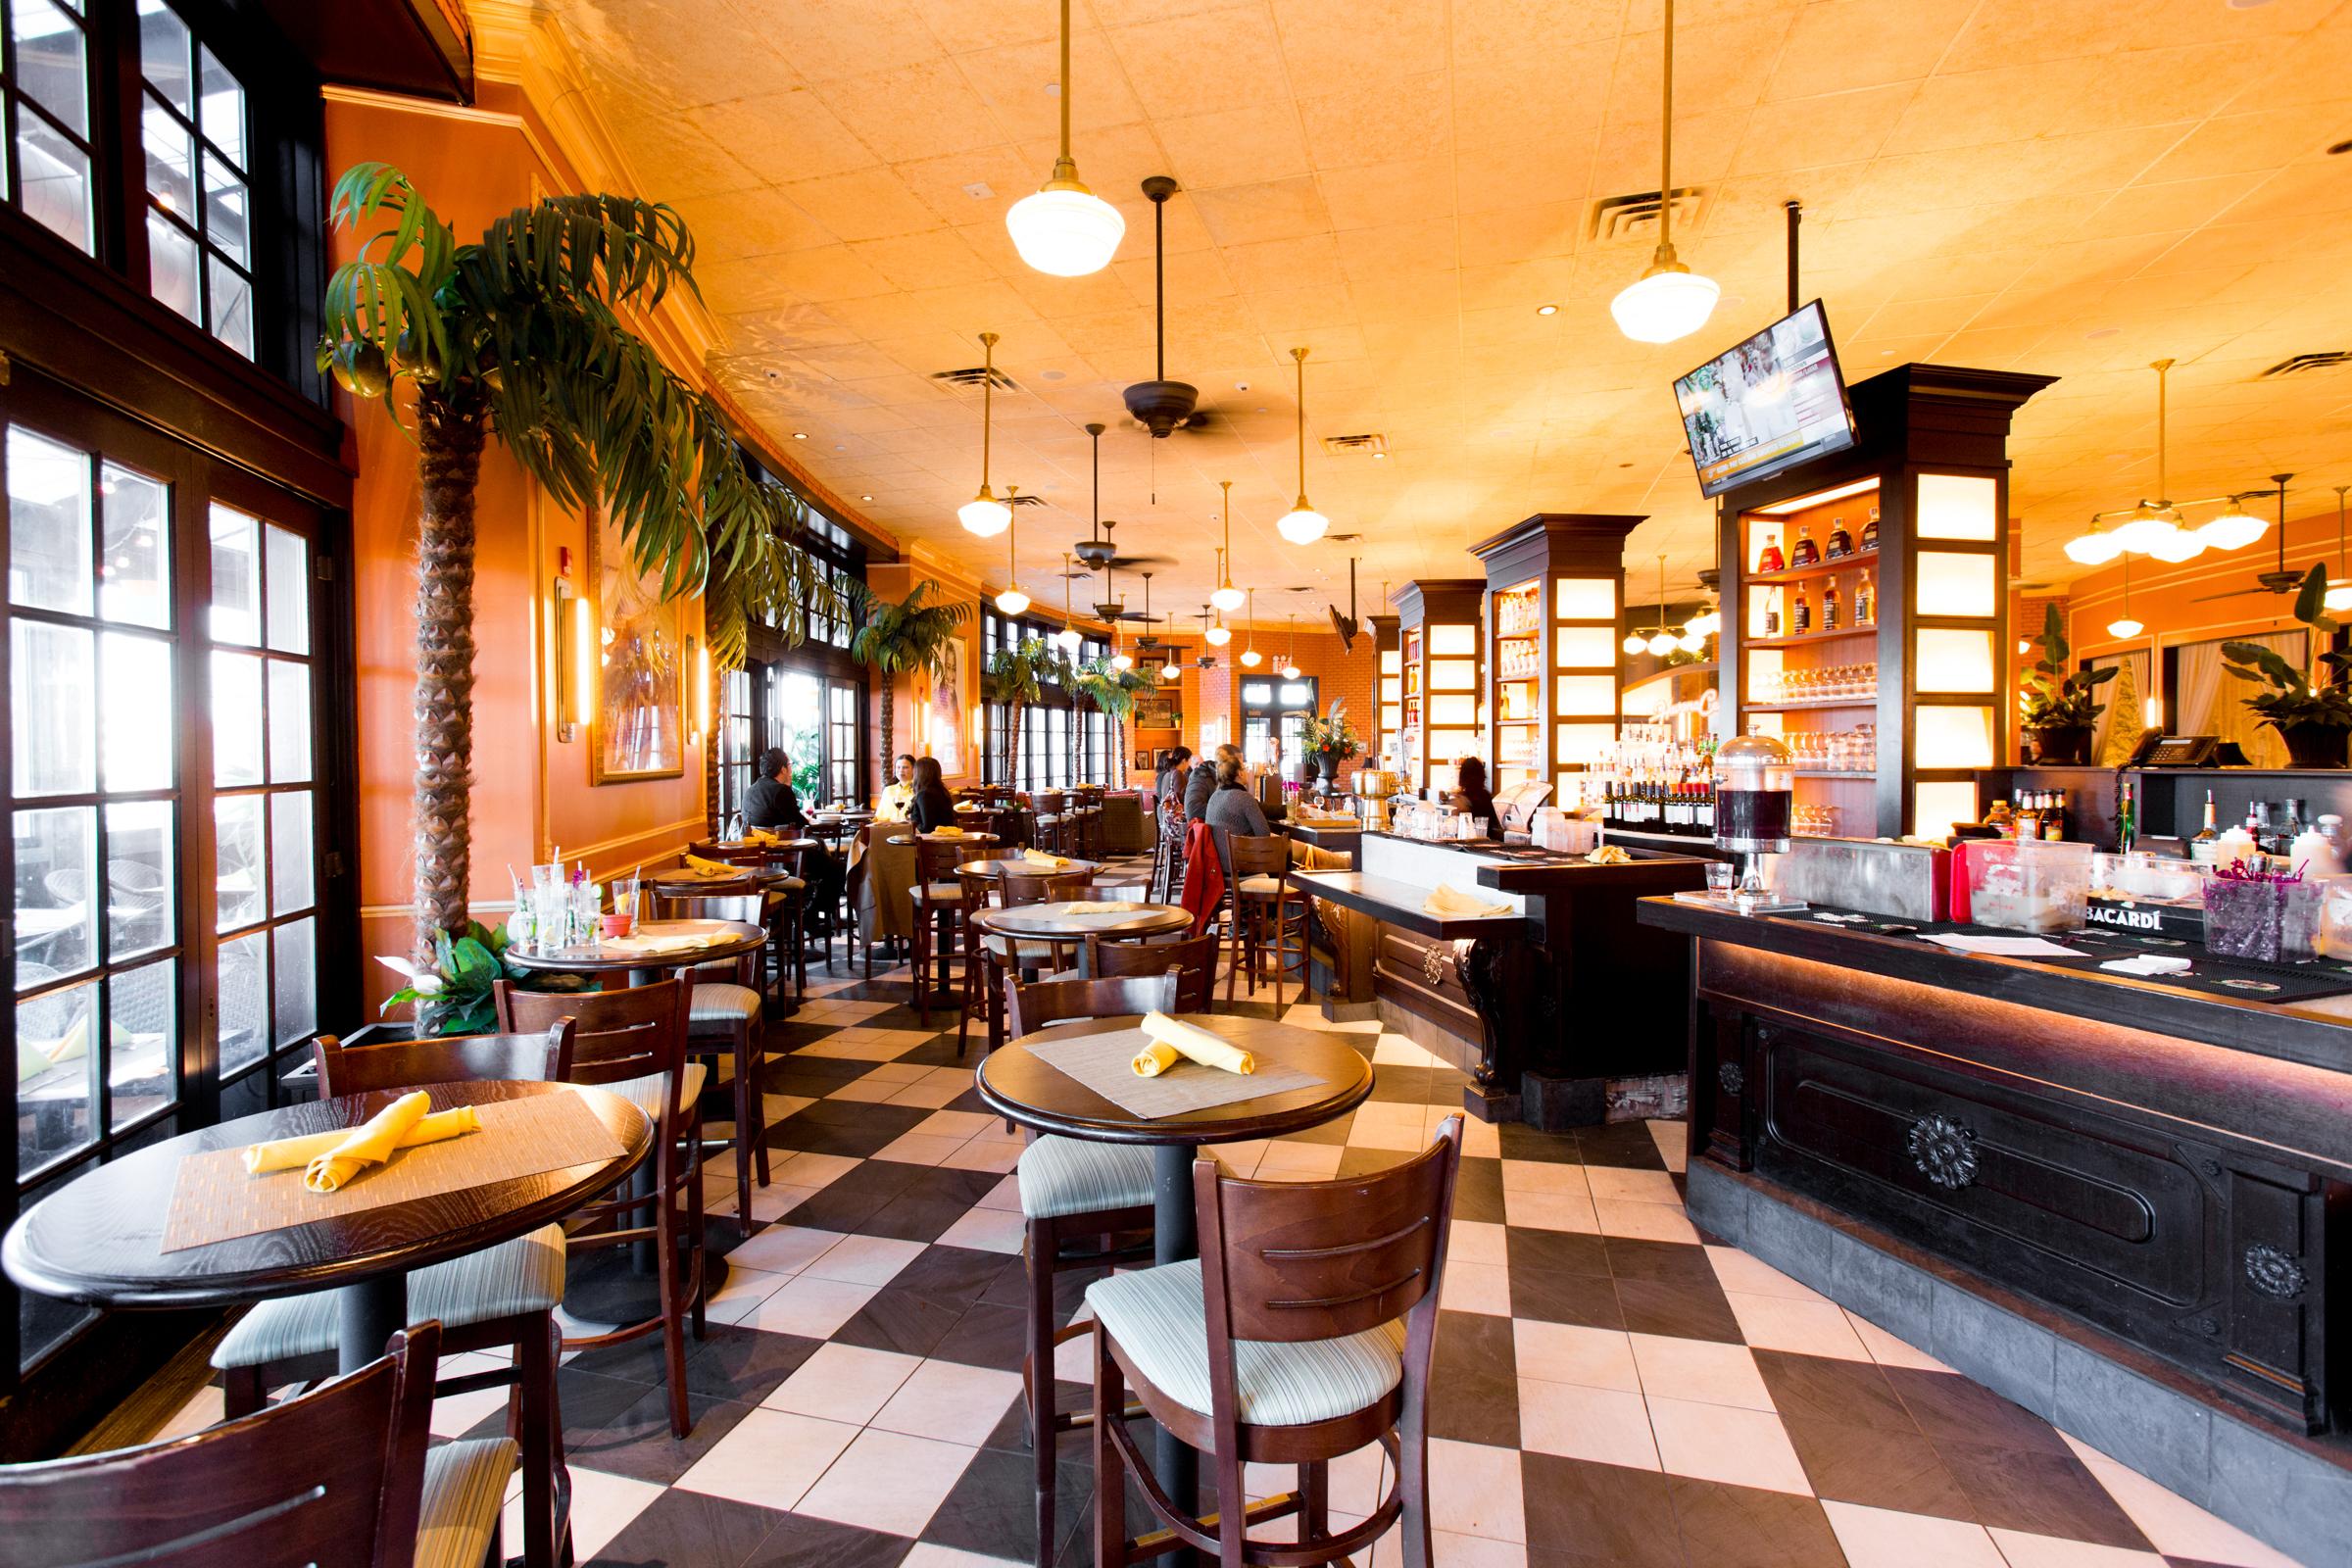 Menlo Park Mall Photos - Havana Central Restaurant and Bar